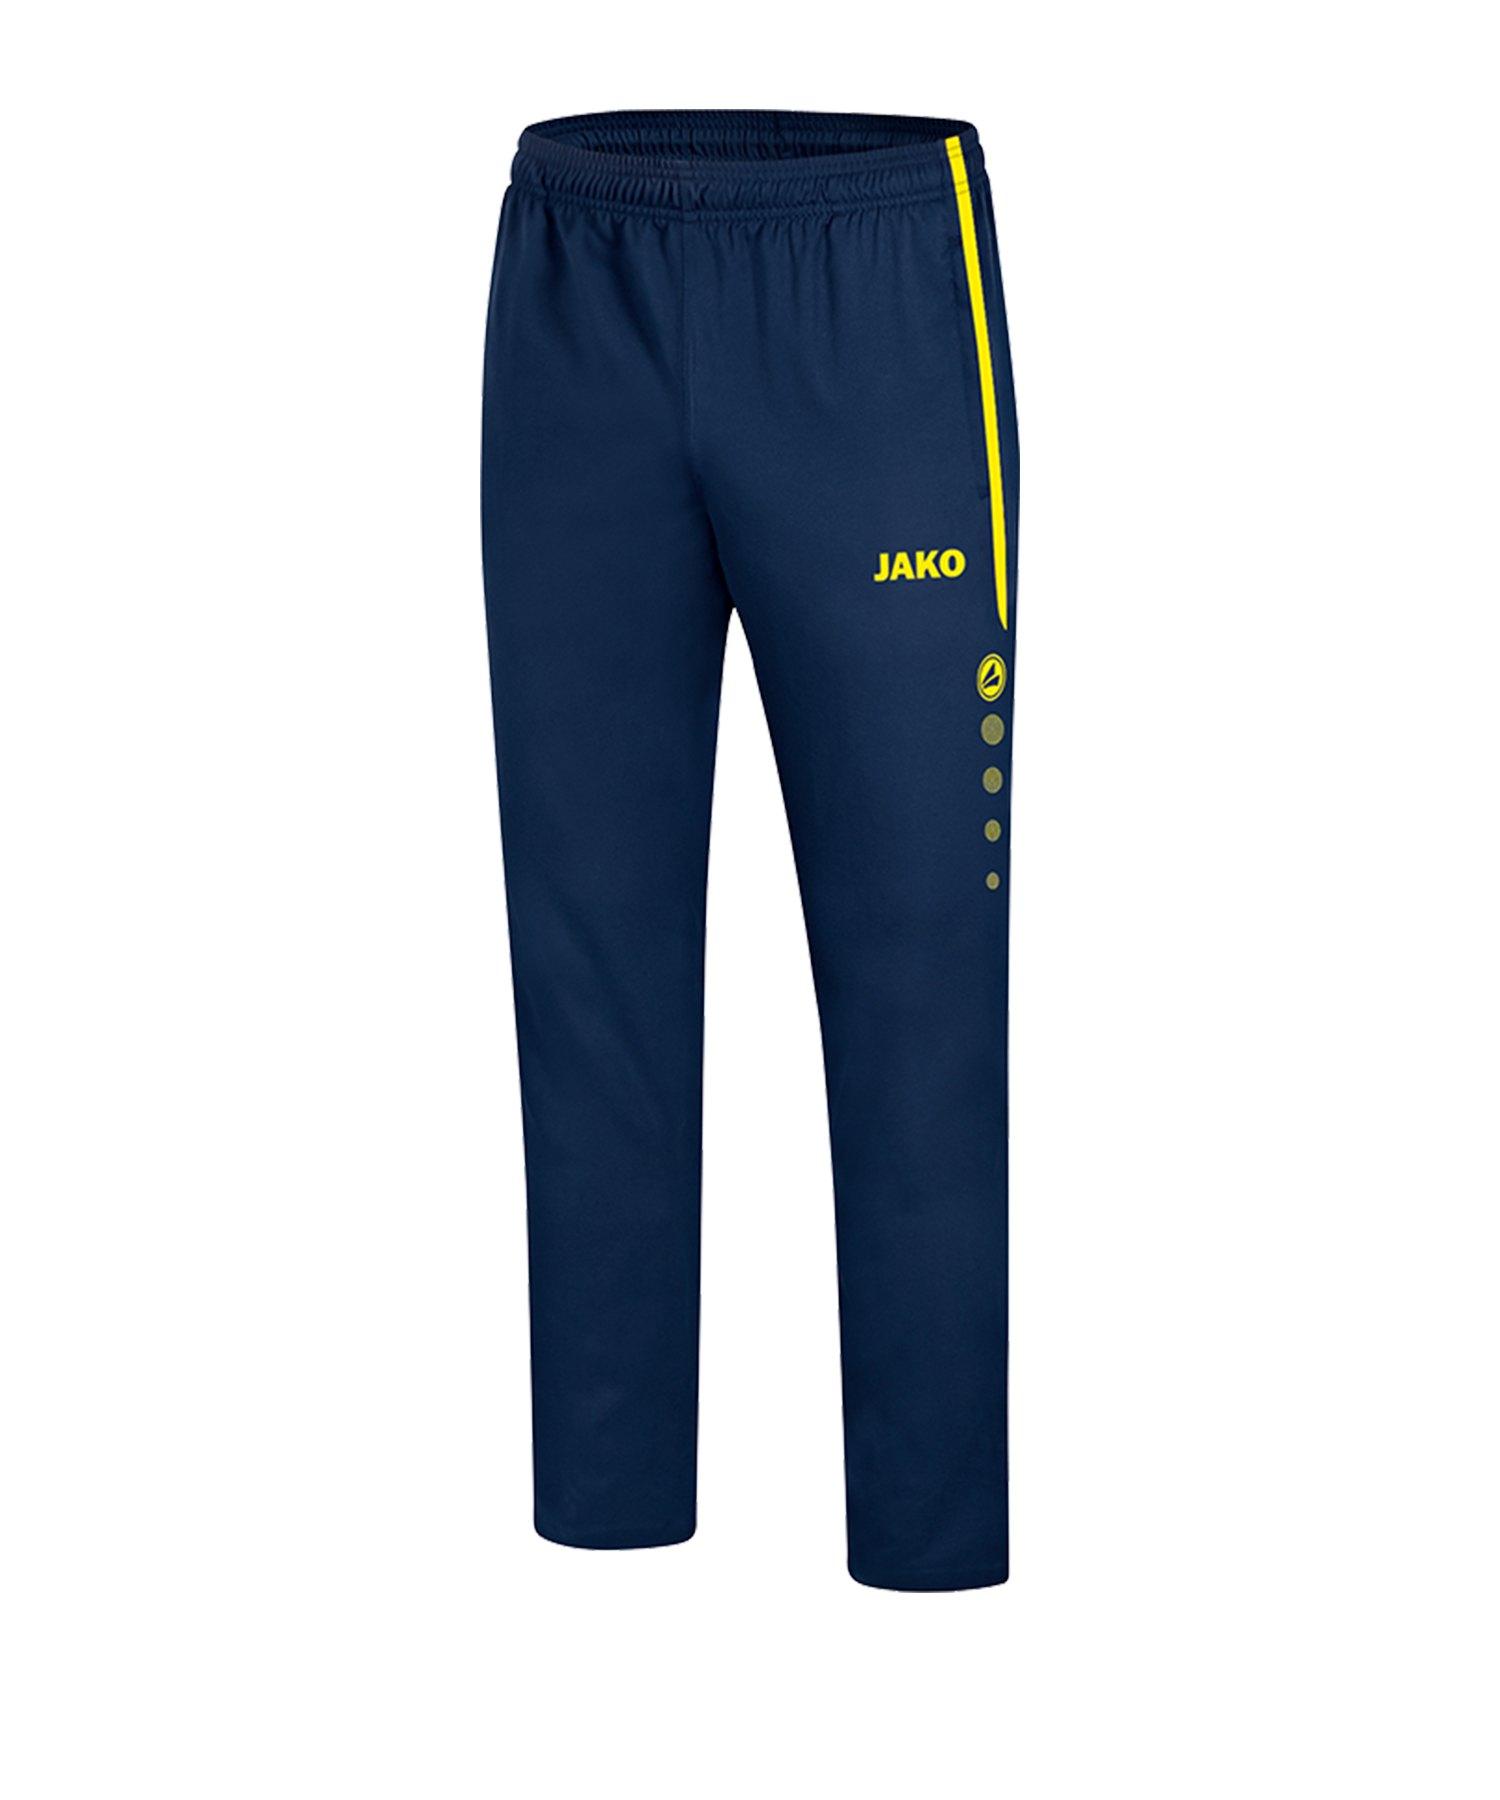 Jako Striker 2.0 Präsentationshose Damen Blau F89 - Blau